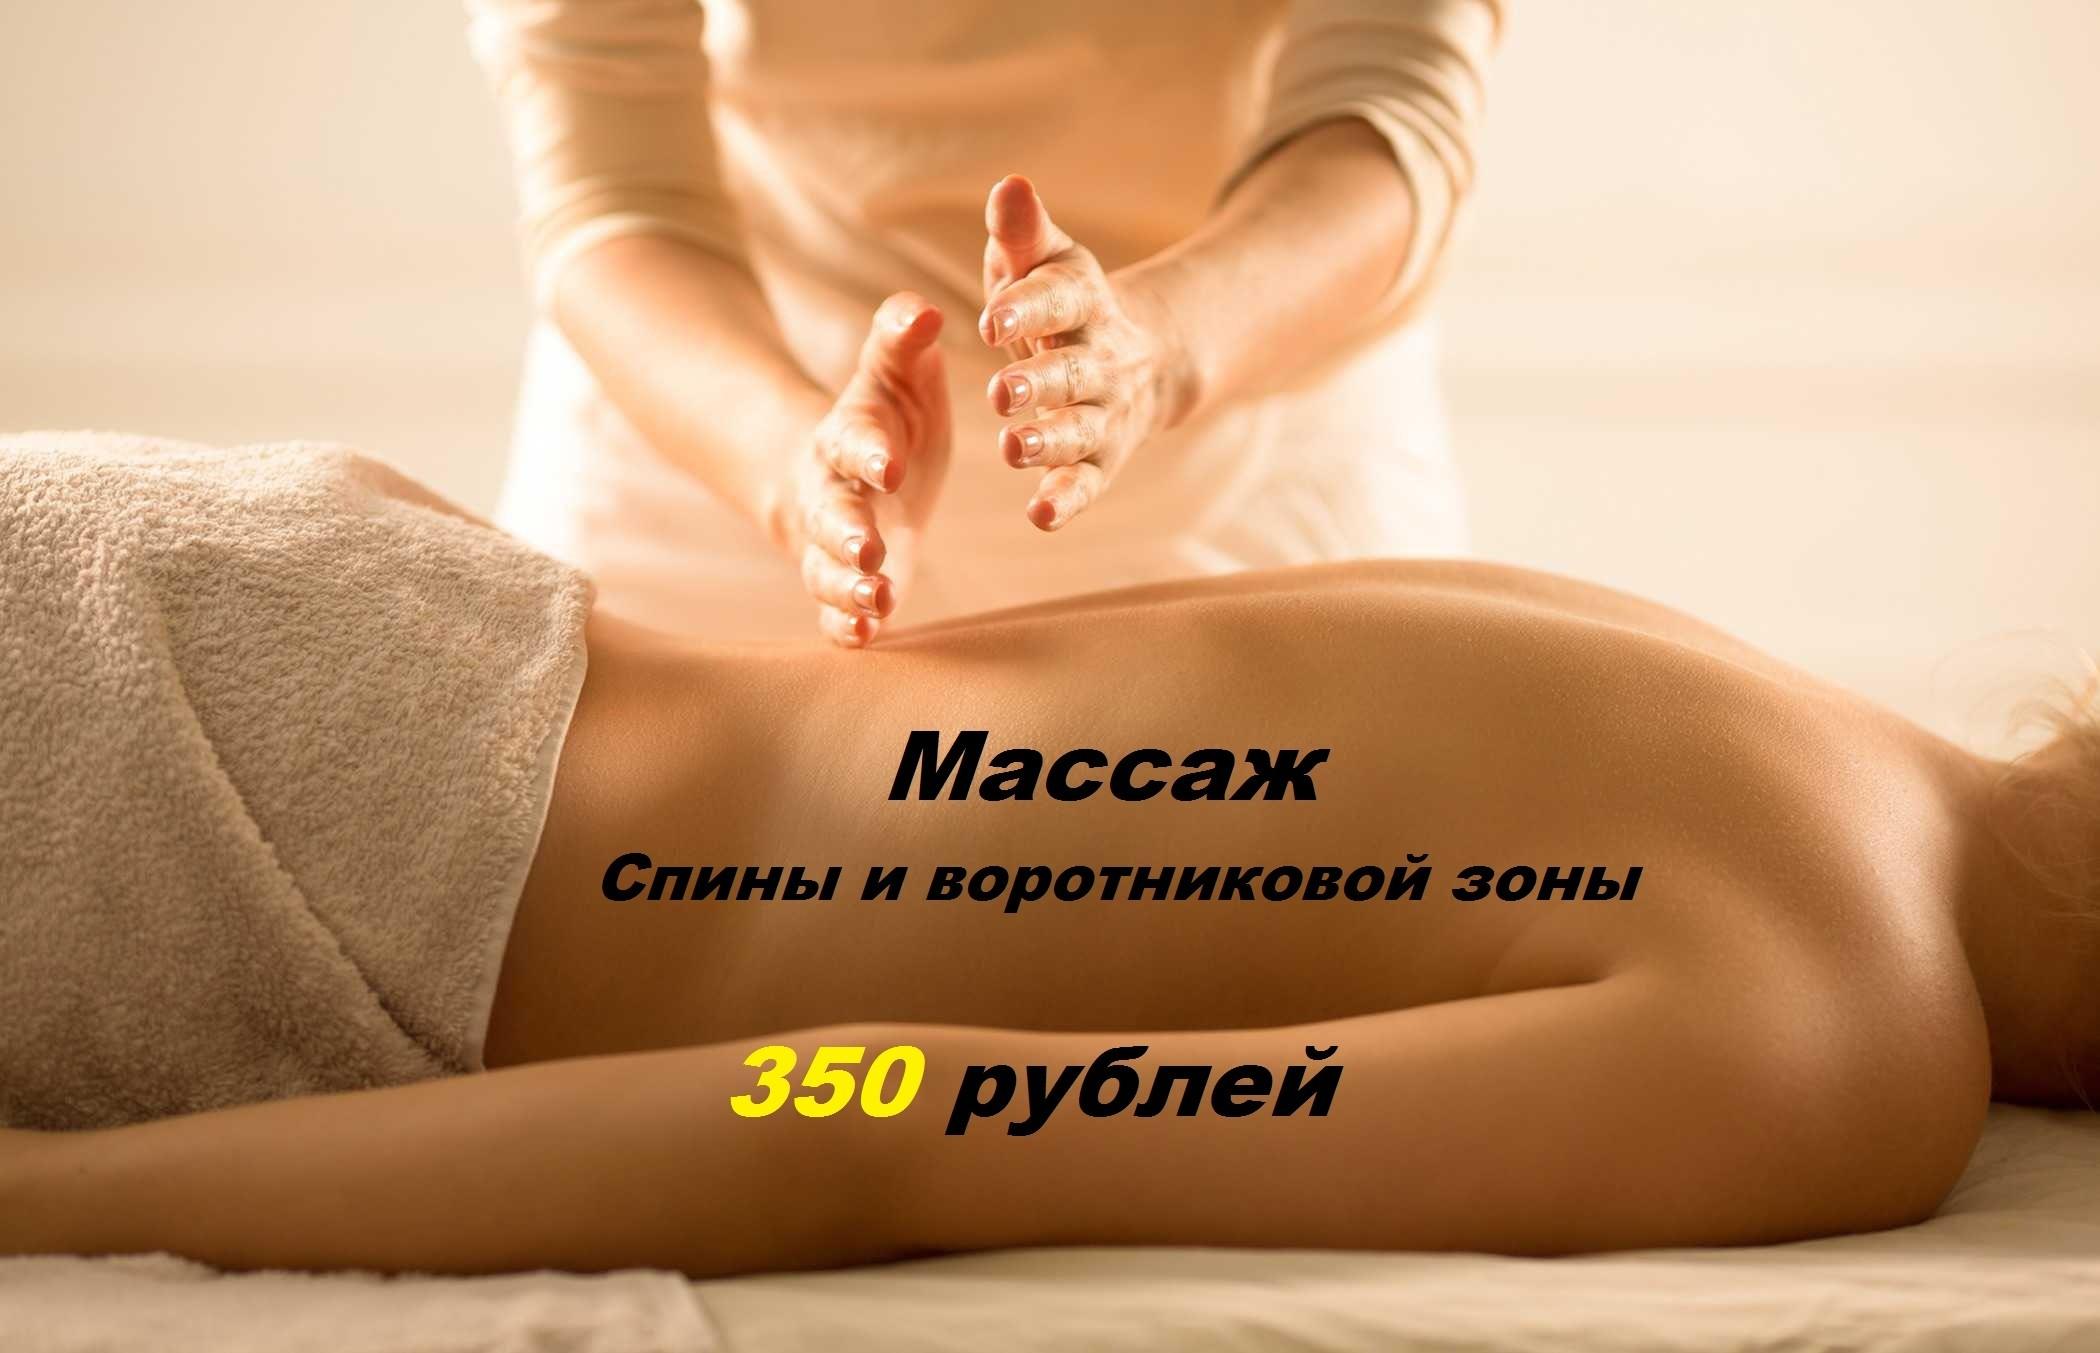 Предлагаю услуги массажа на дому